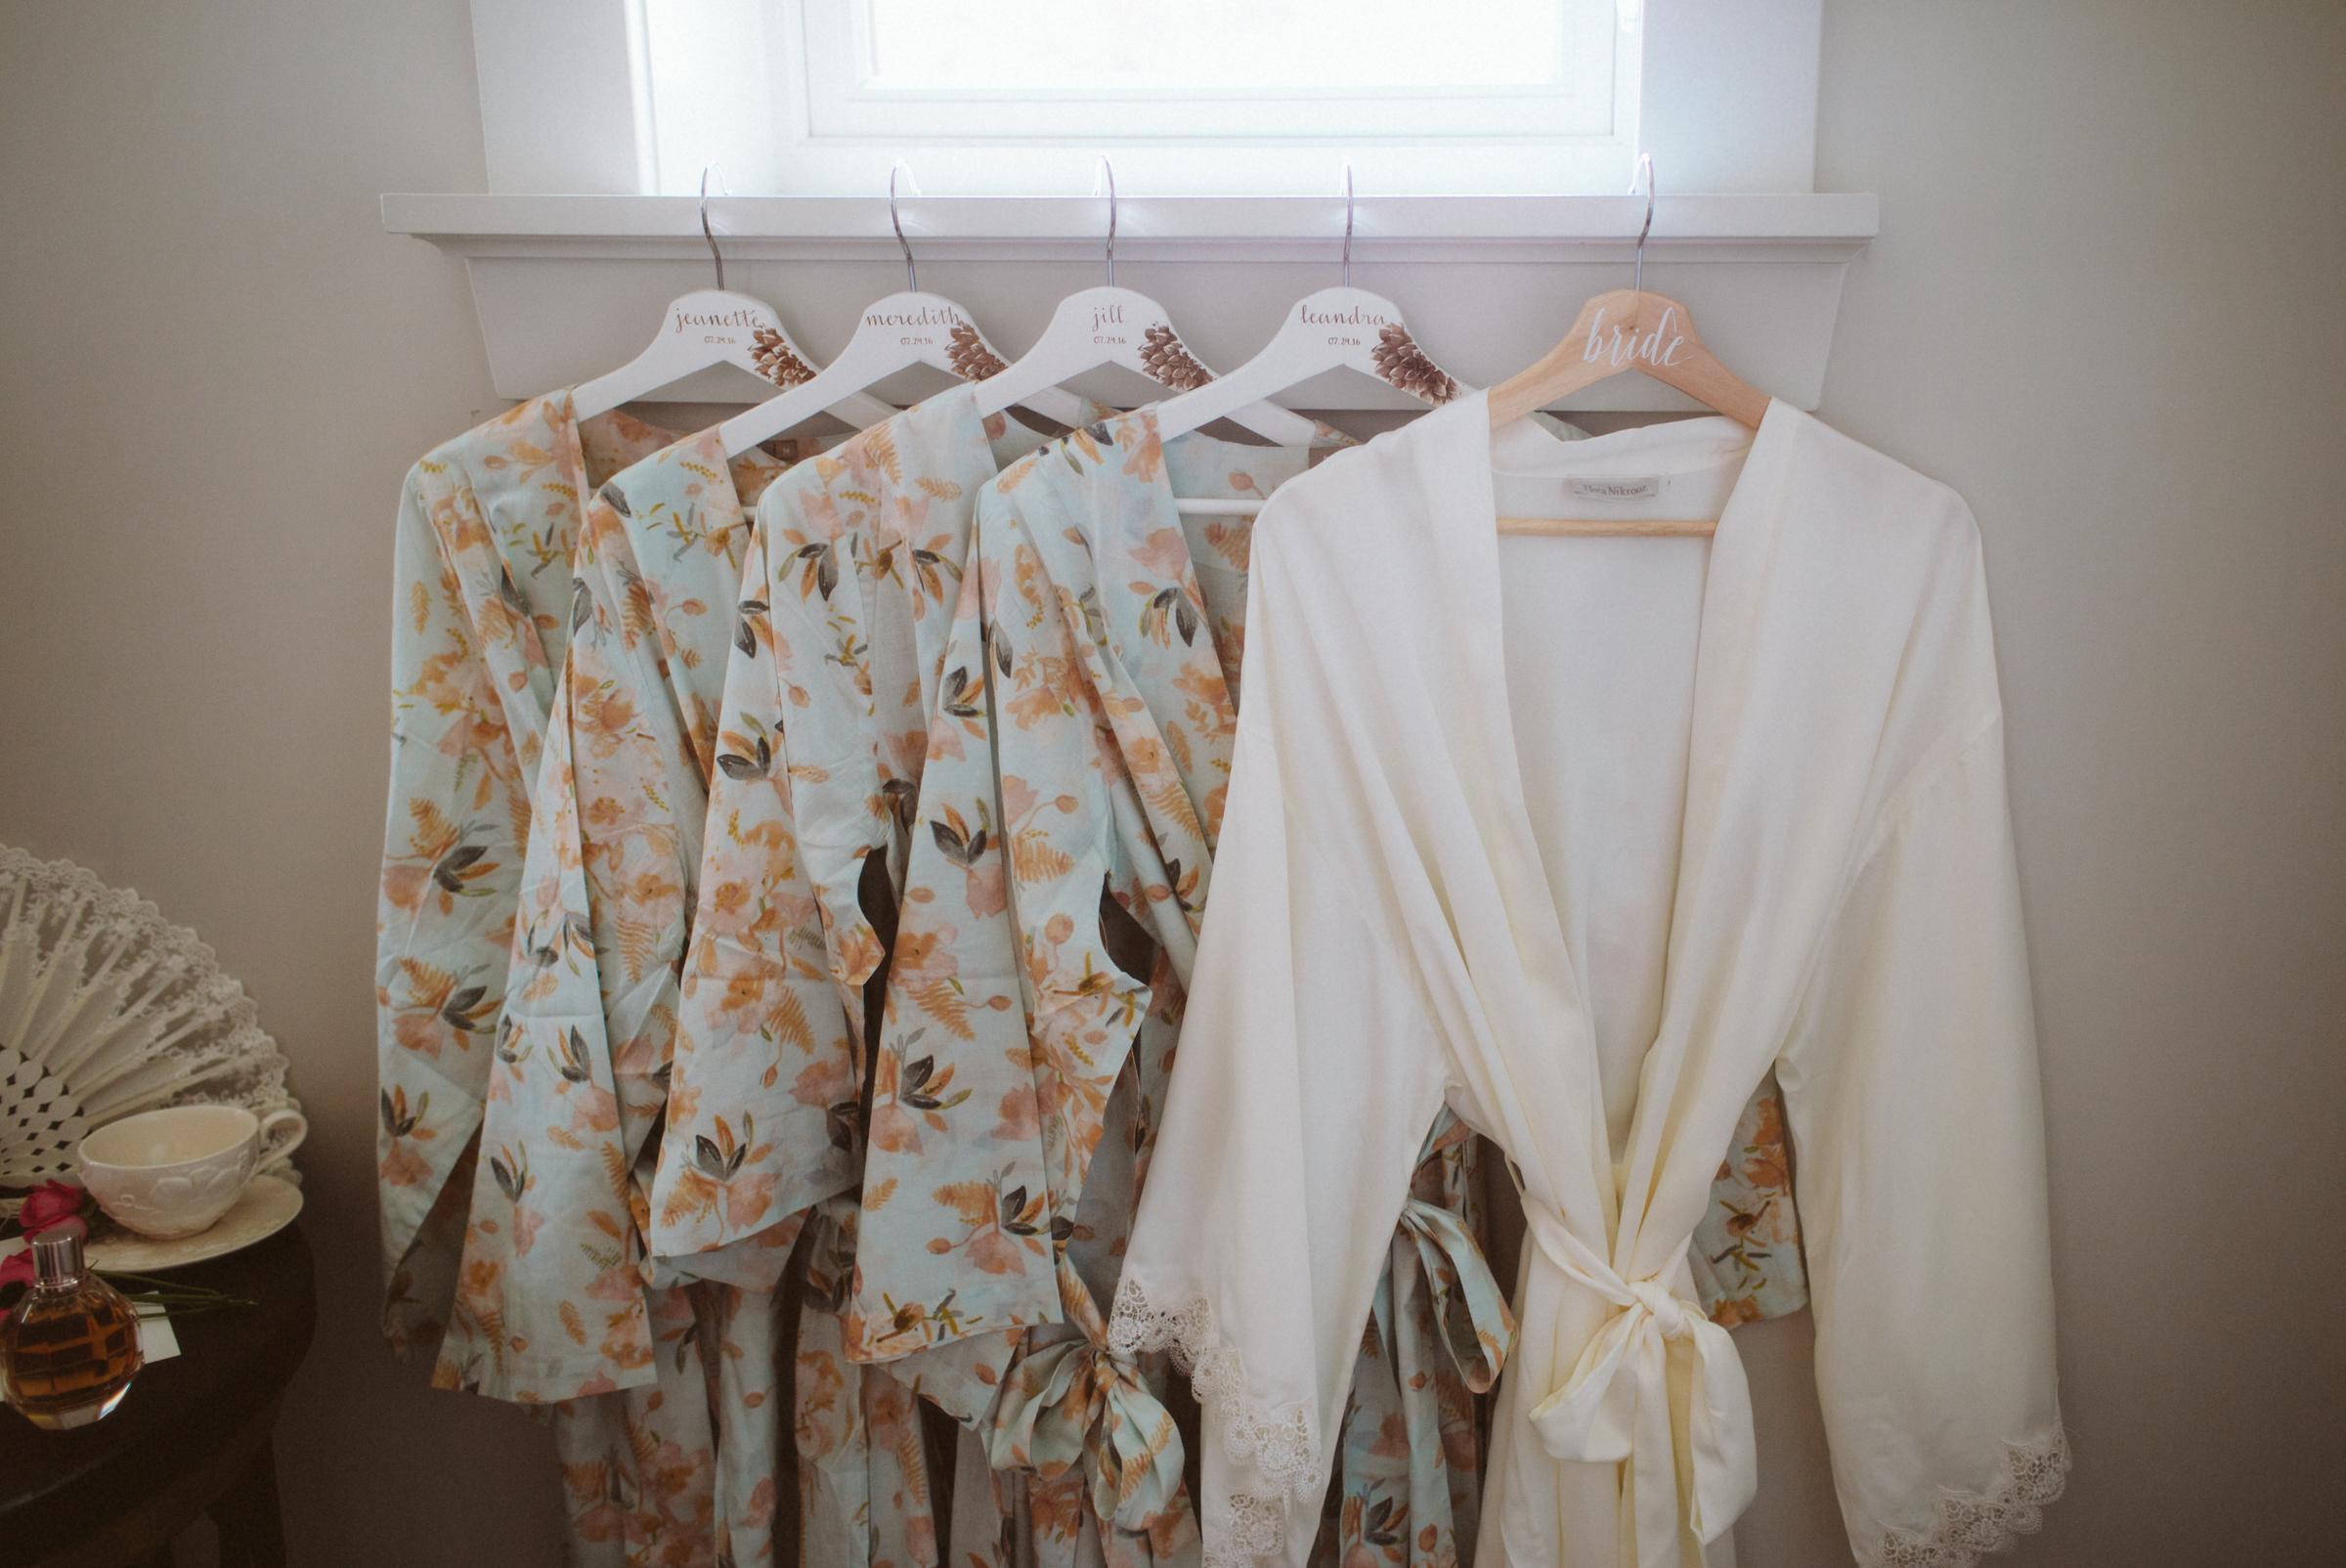 wedding day | MFA St Pete | Vanessa Boy Photography | vanessaboy.com-1.com |final.jpg